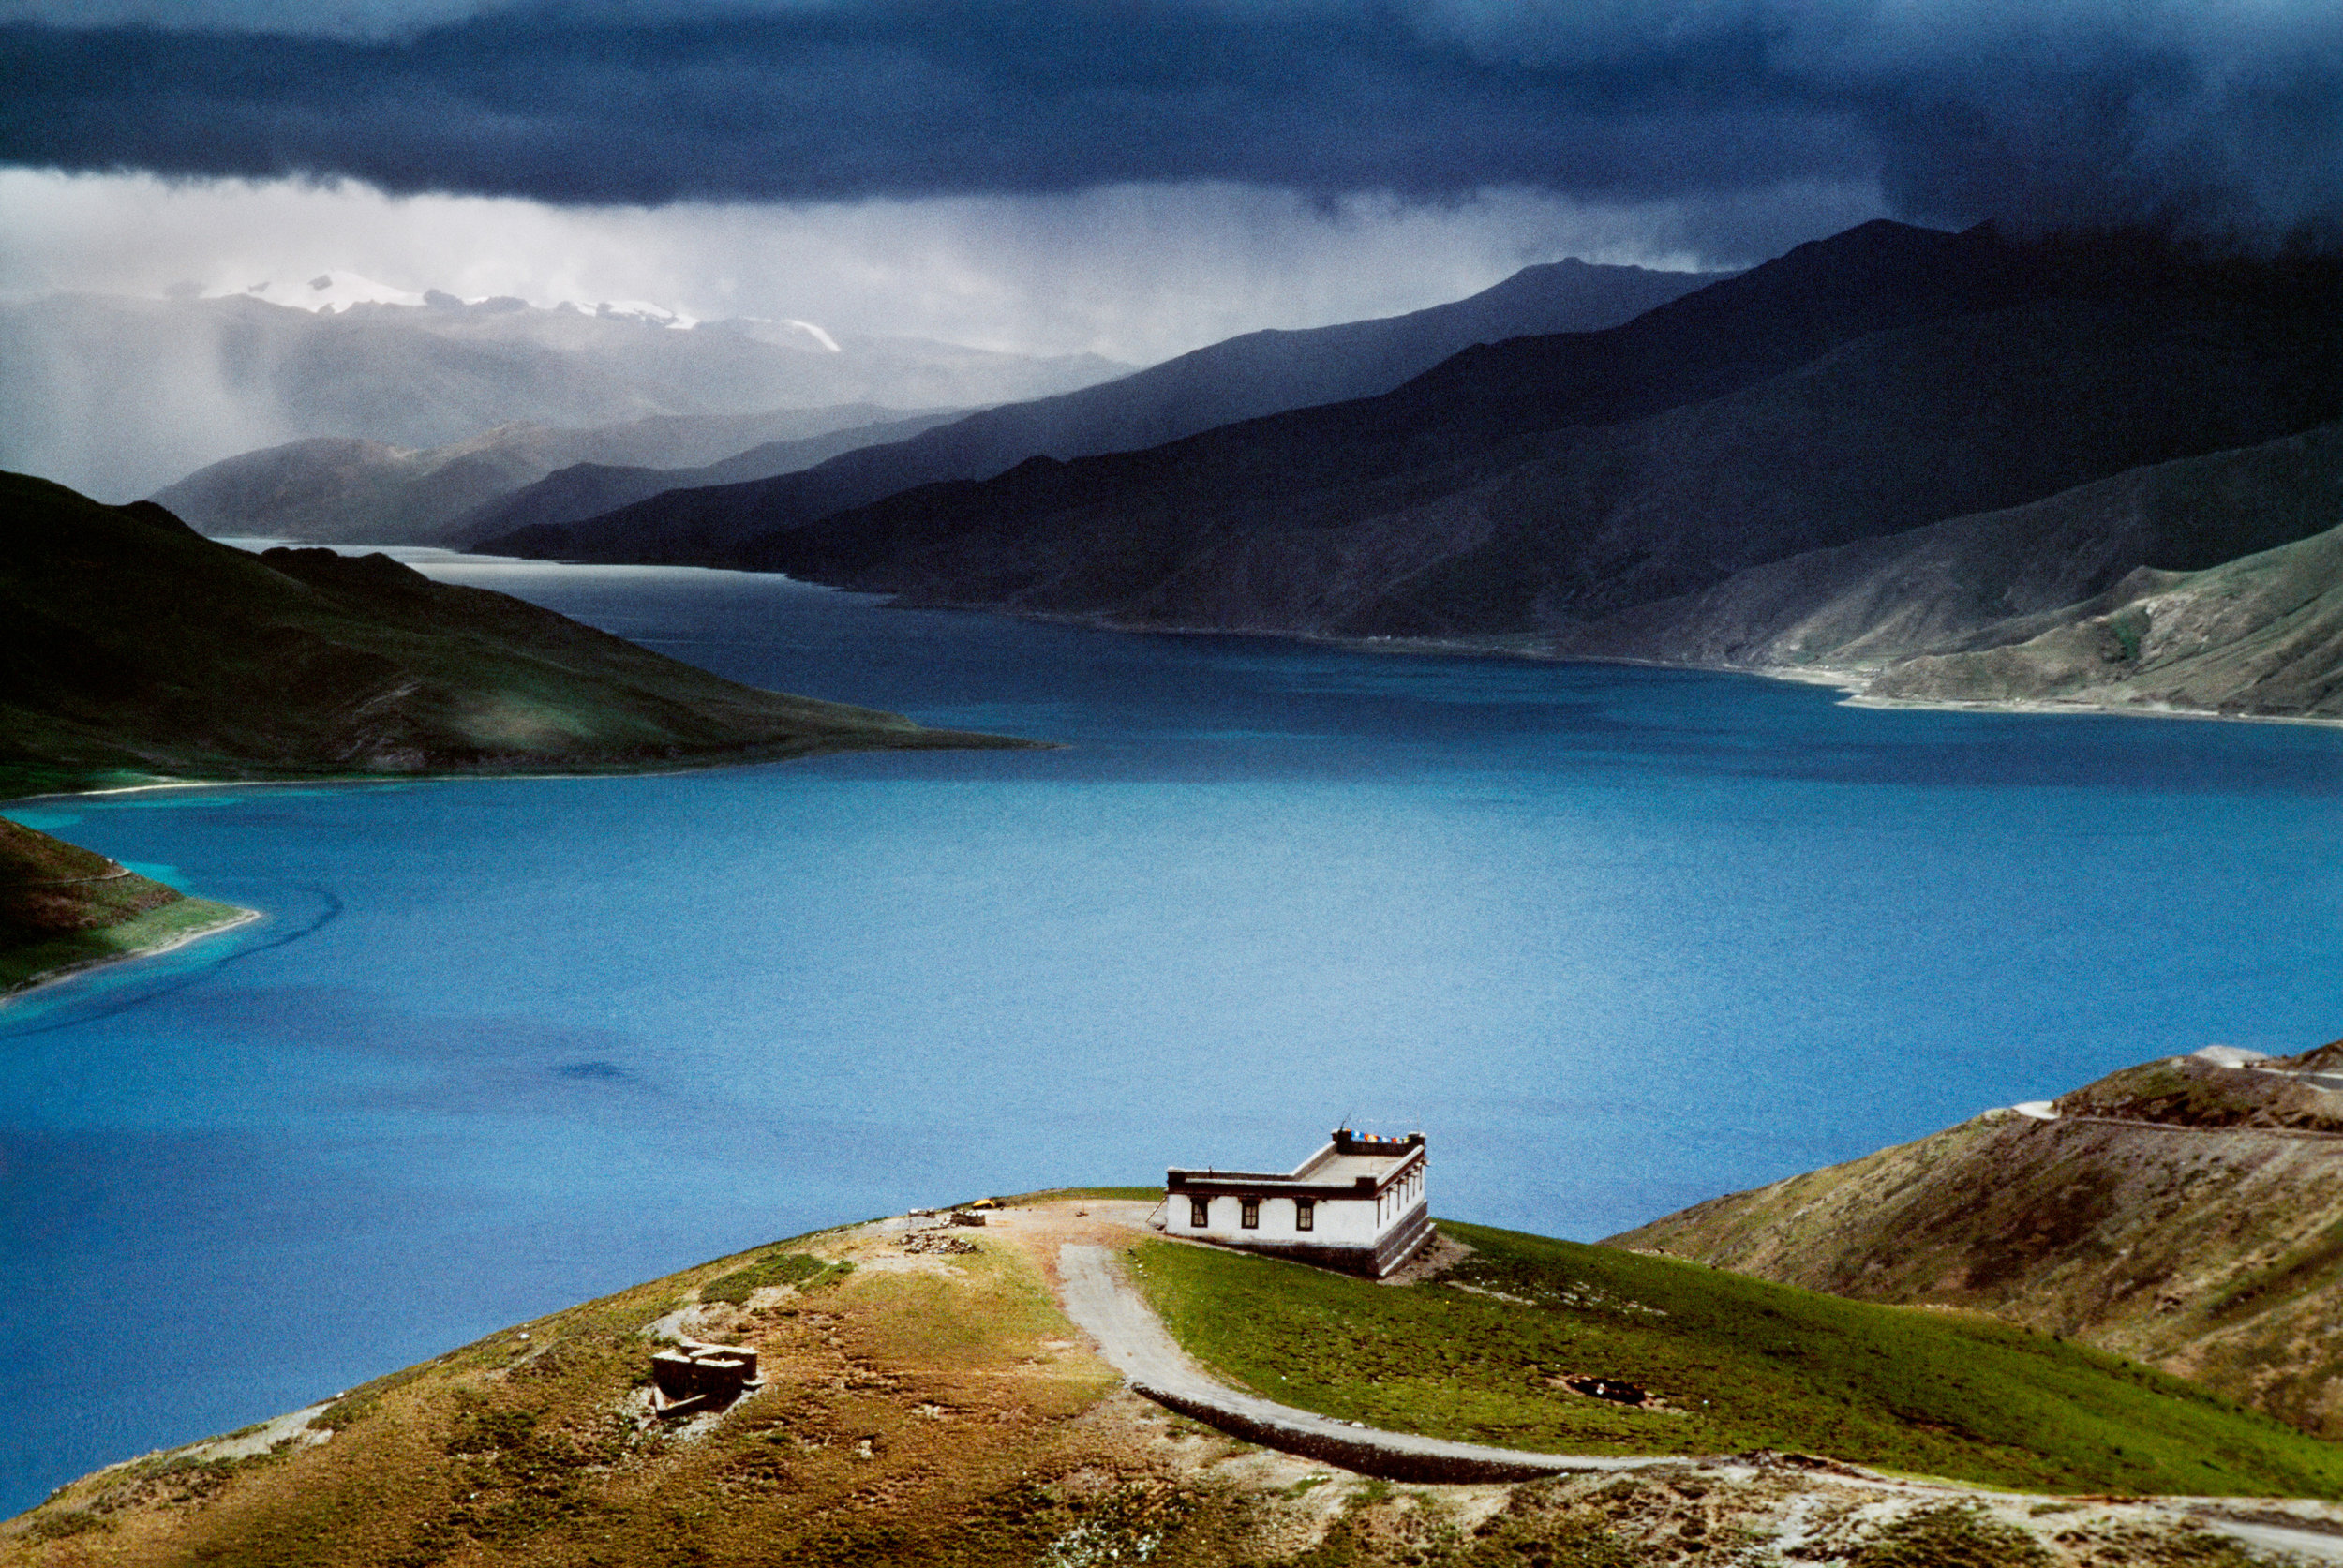 STEVE MCCURRY,  Yamdrok Tso Lake, Lhasa, Tibet